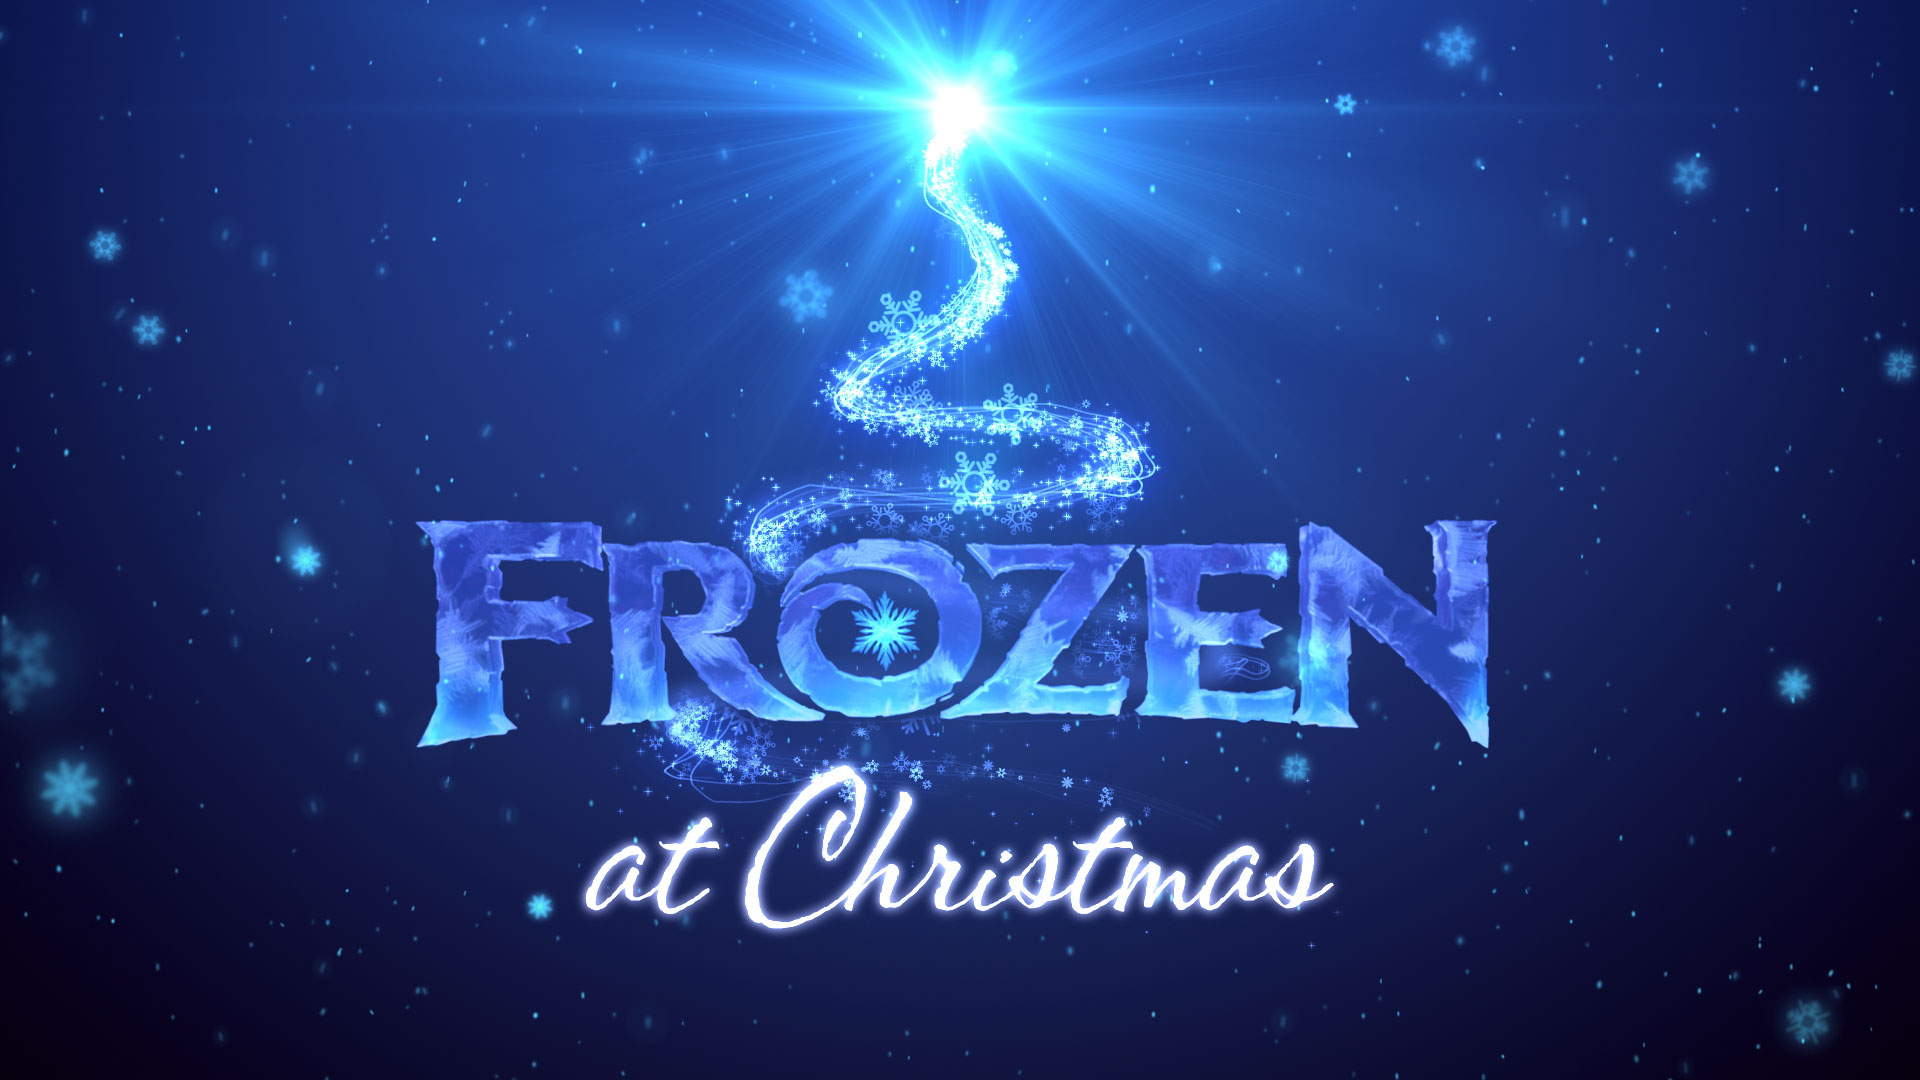 ©Holey & Moley 2014 Frozen at Christmas